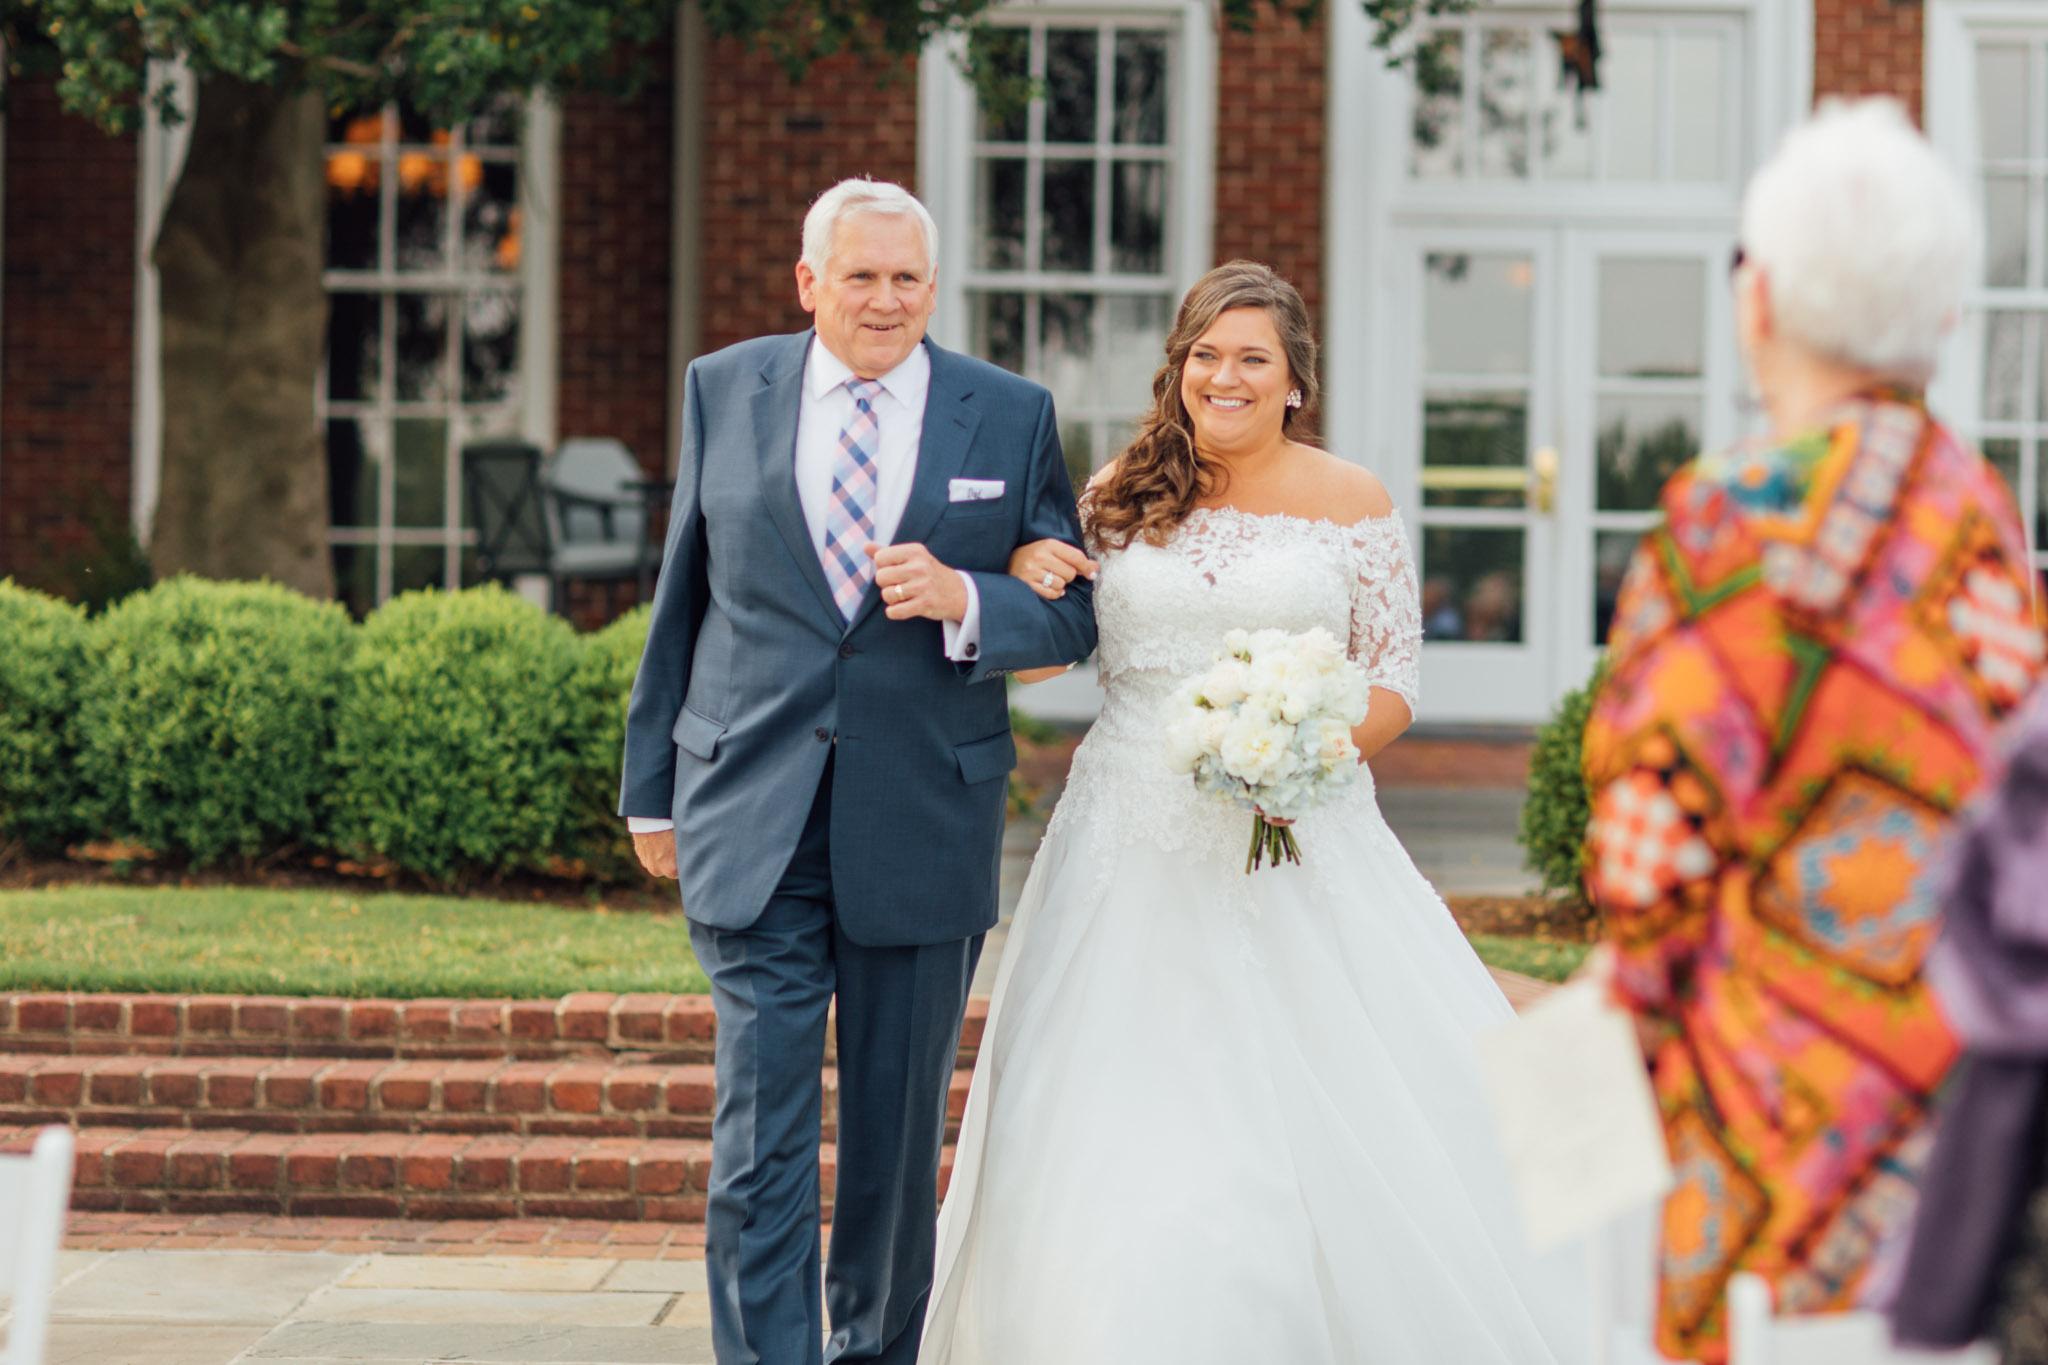 Country Club of Virginia Wedding Photographer_0052.jpg